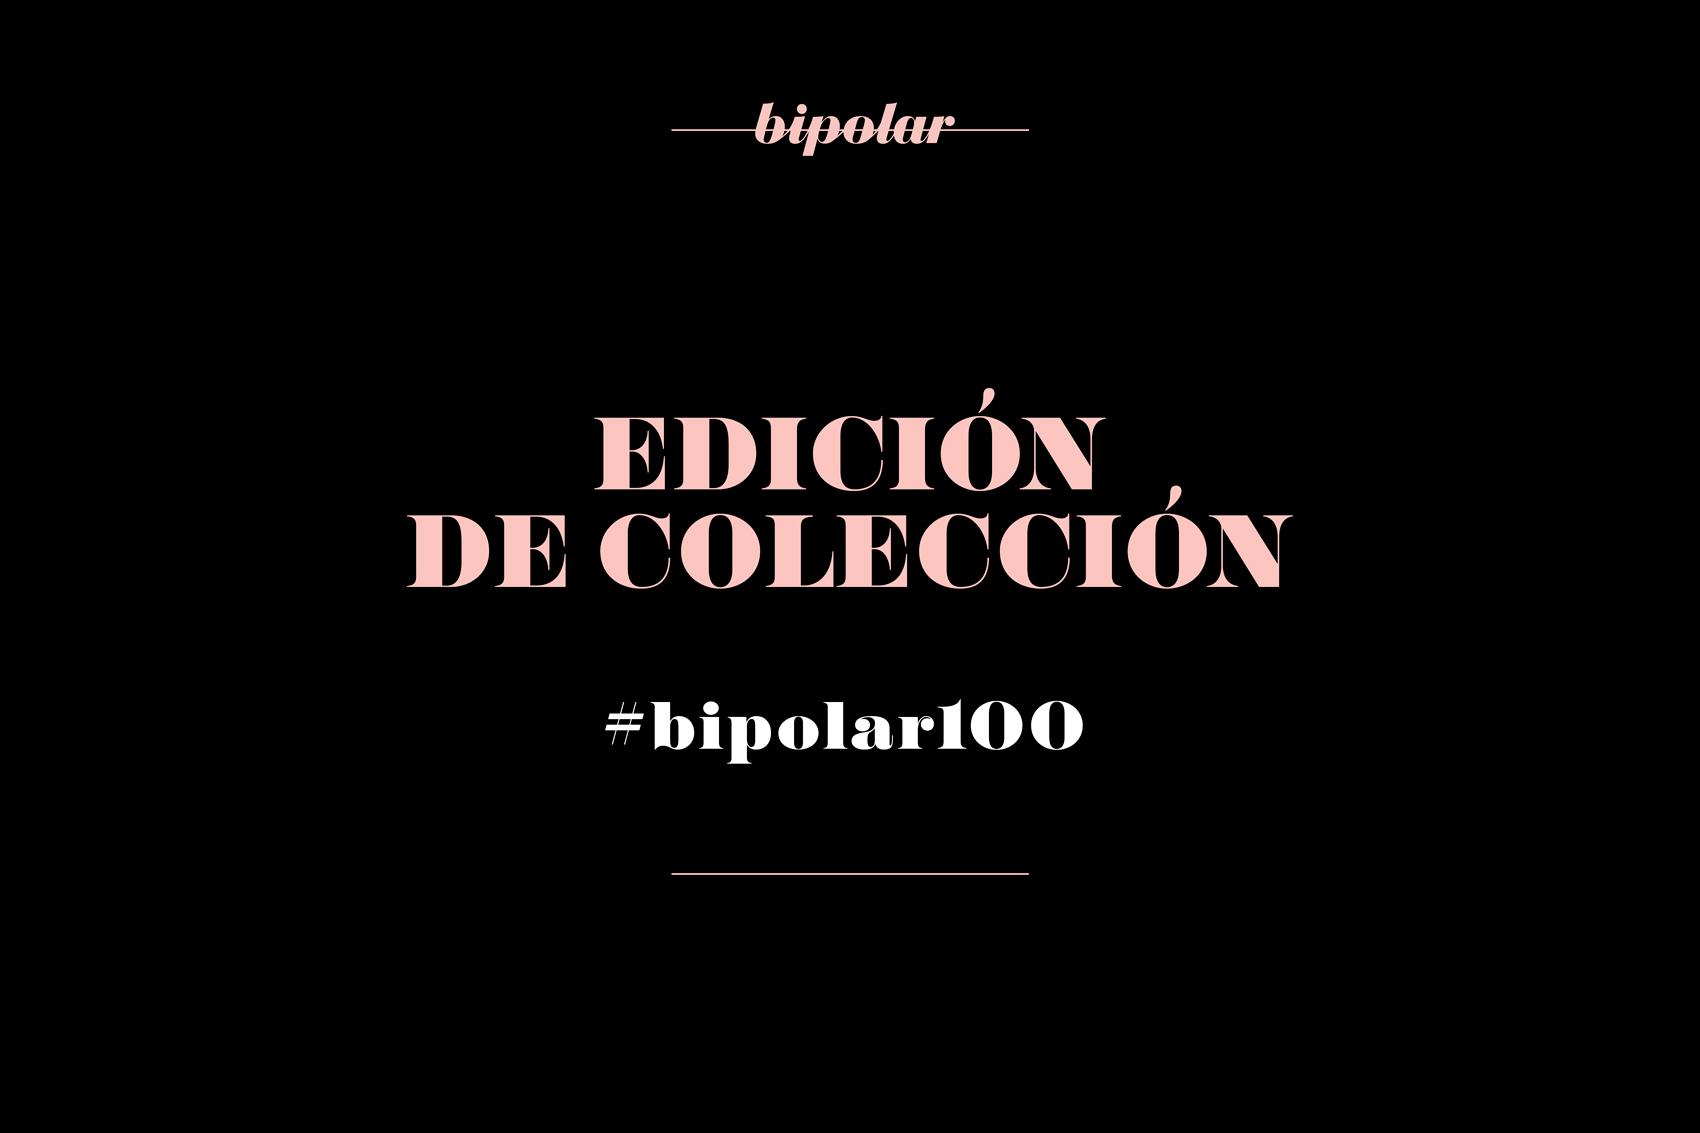 Bipolar#100